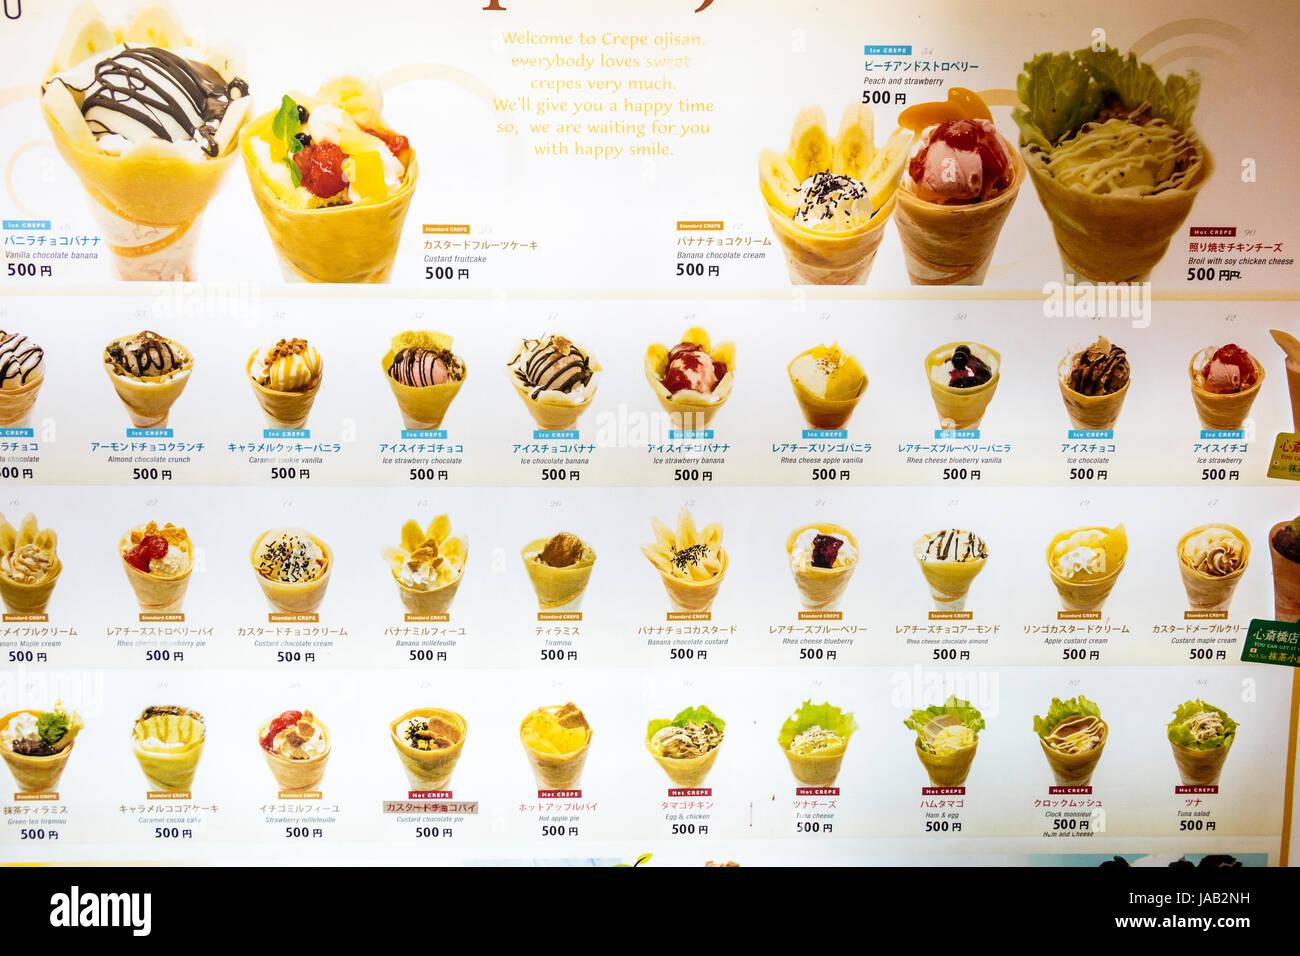 Japan Osaka Shinsaibashi Menu Board With Various Types Of Savory Stock Photo Alamy